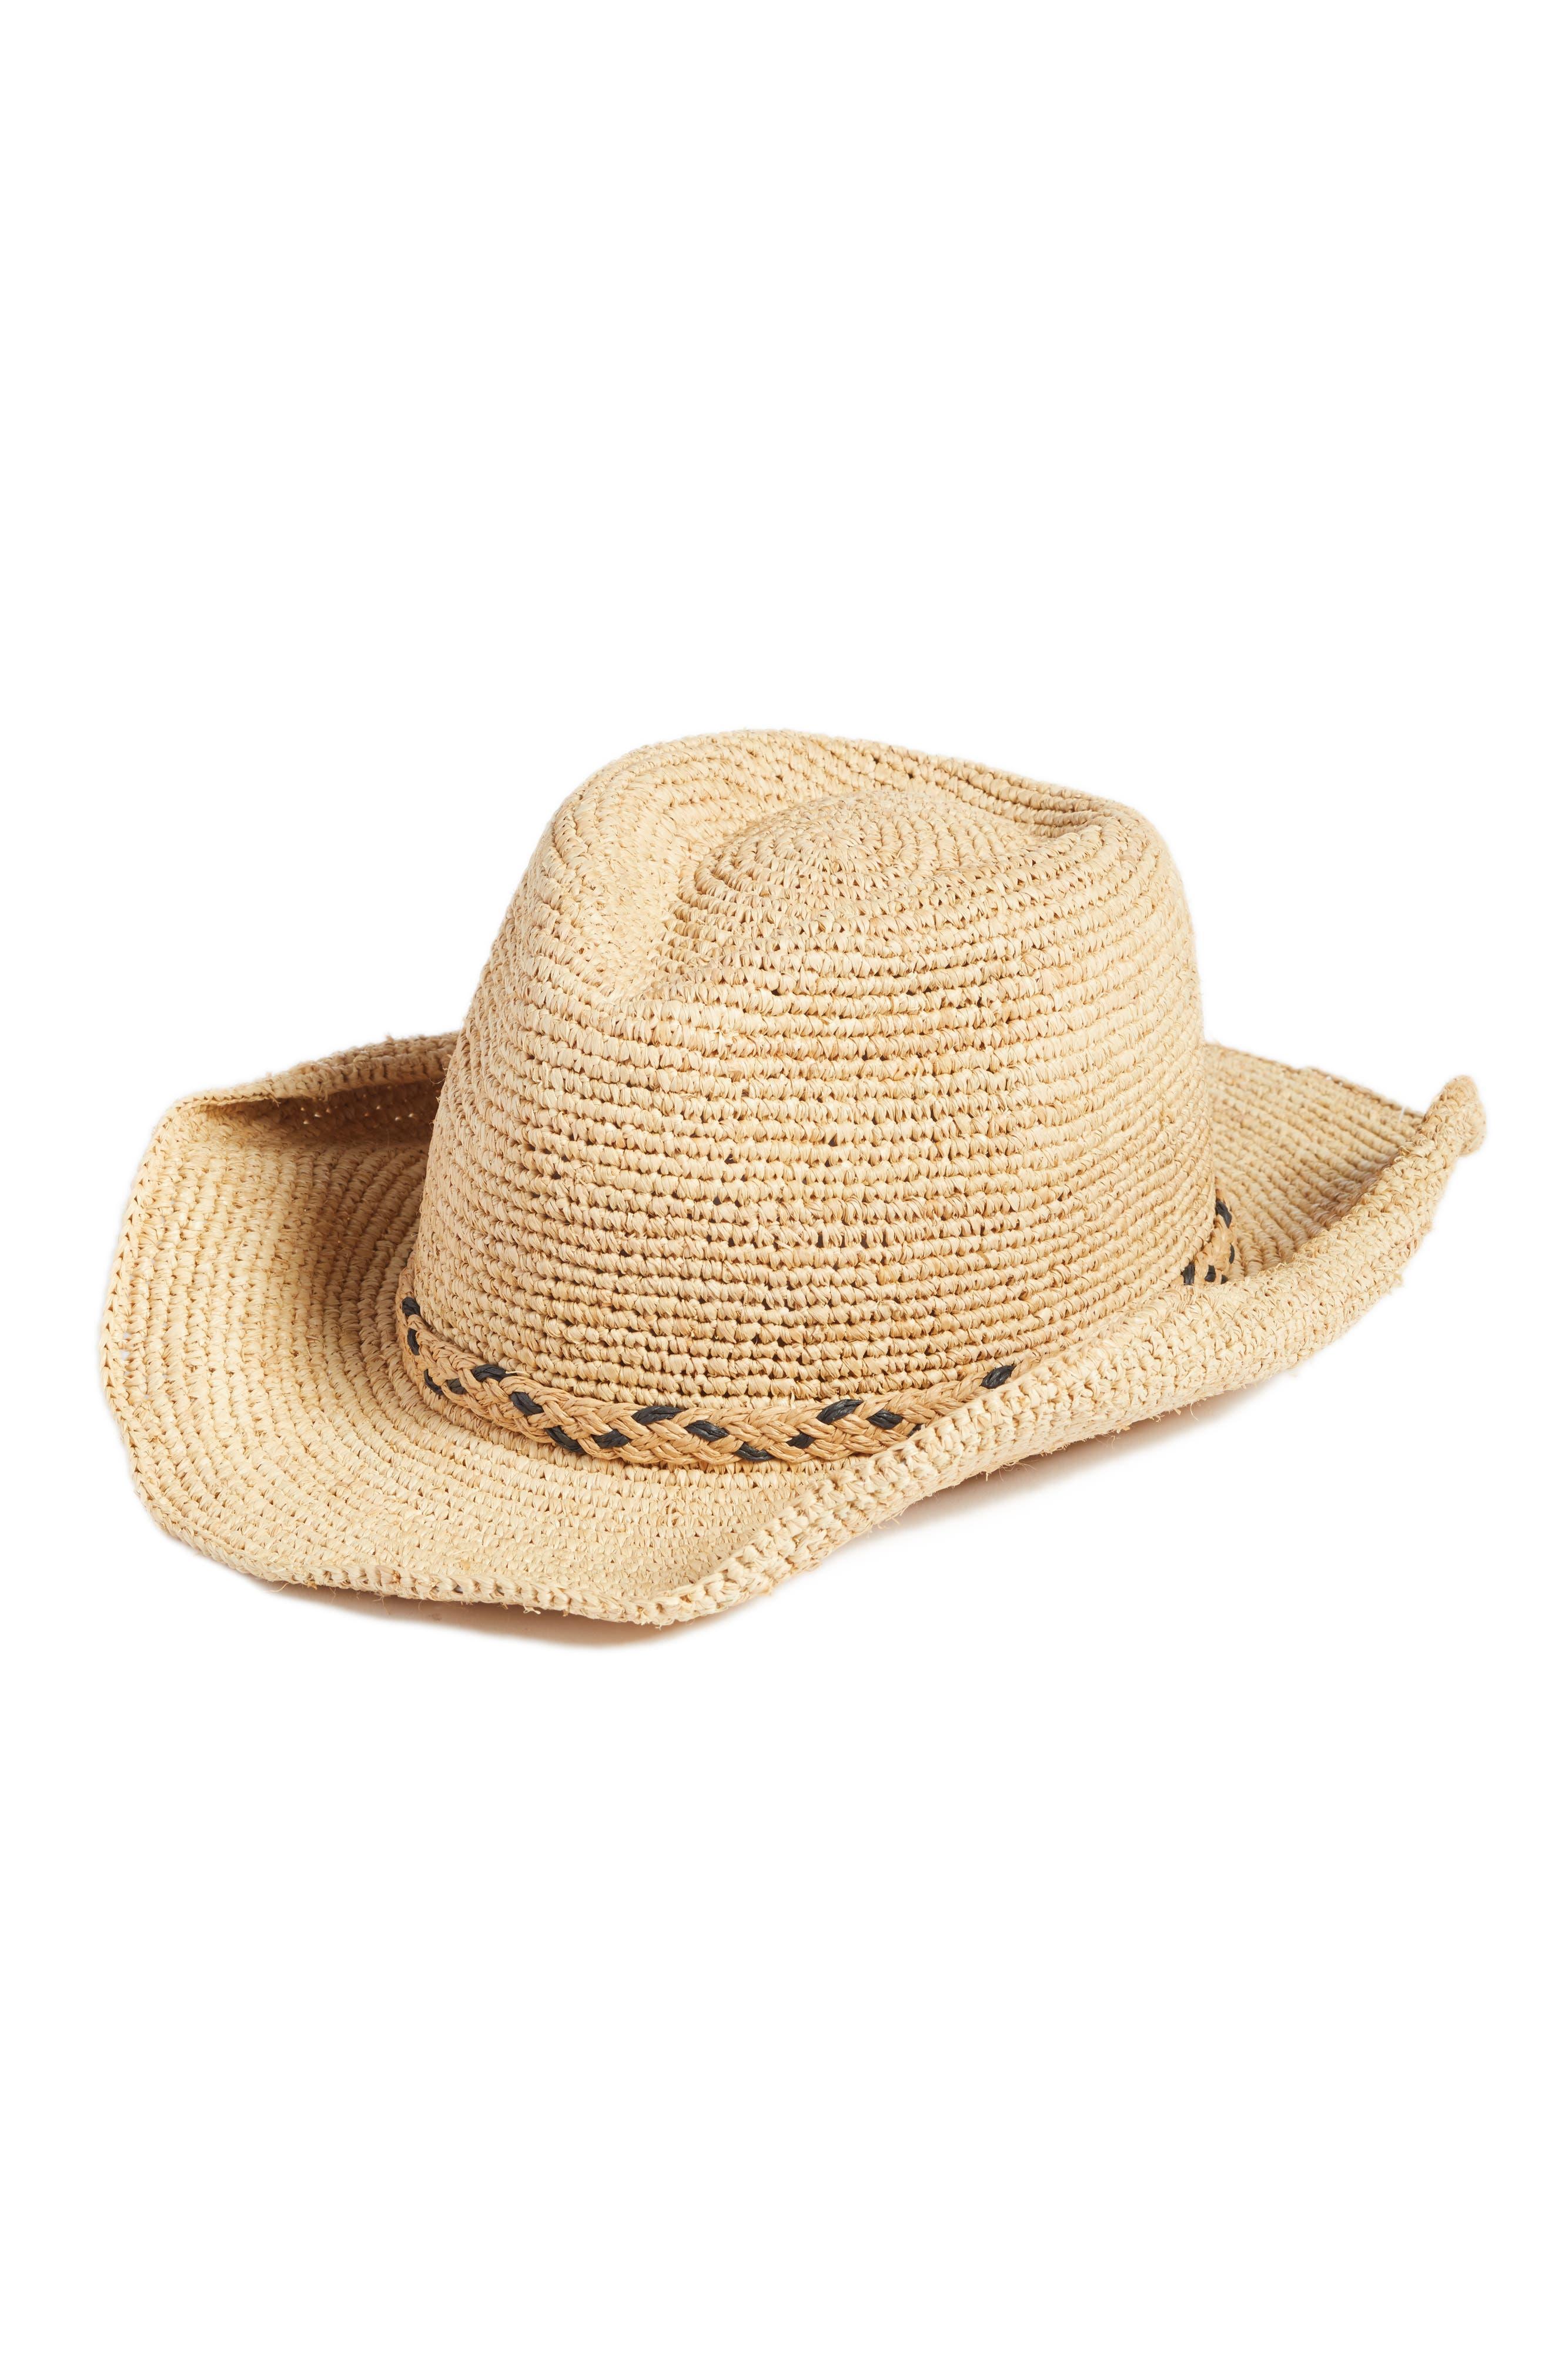 Packable Raffia Panama Hat,                             Main thumbnail 1, color,                             235